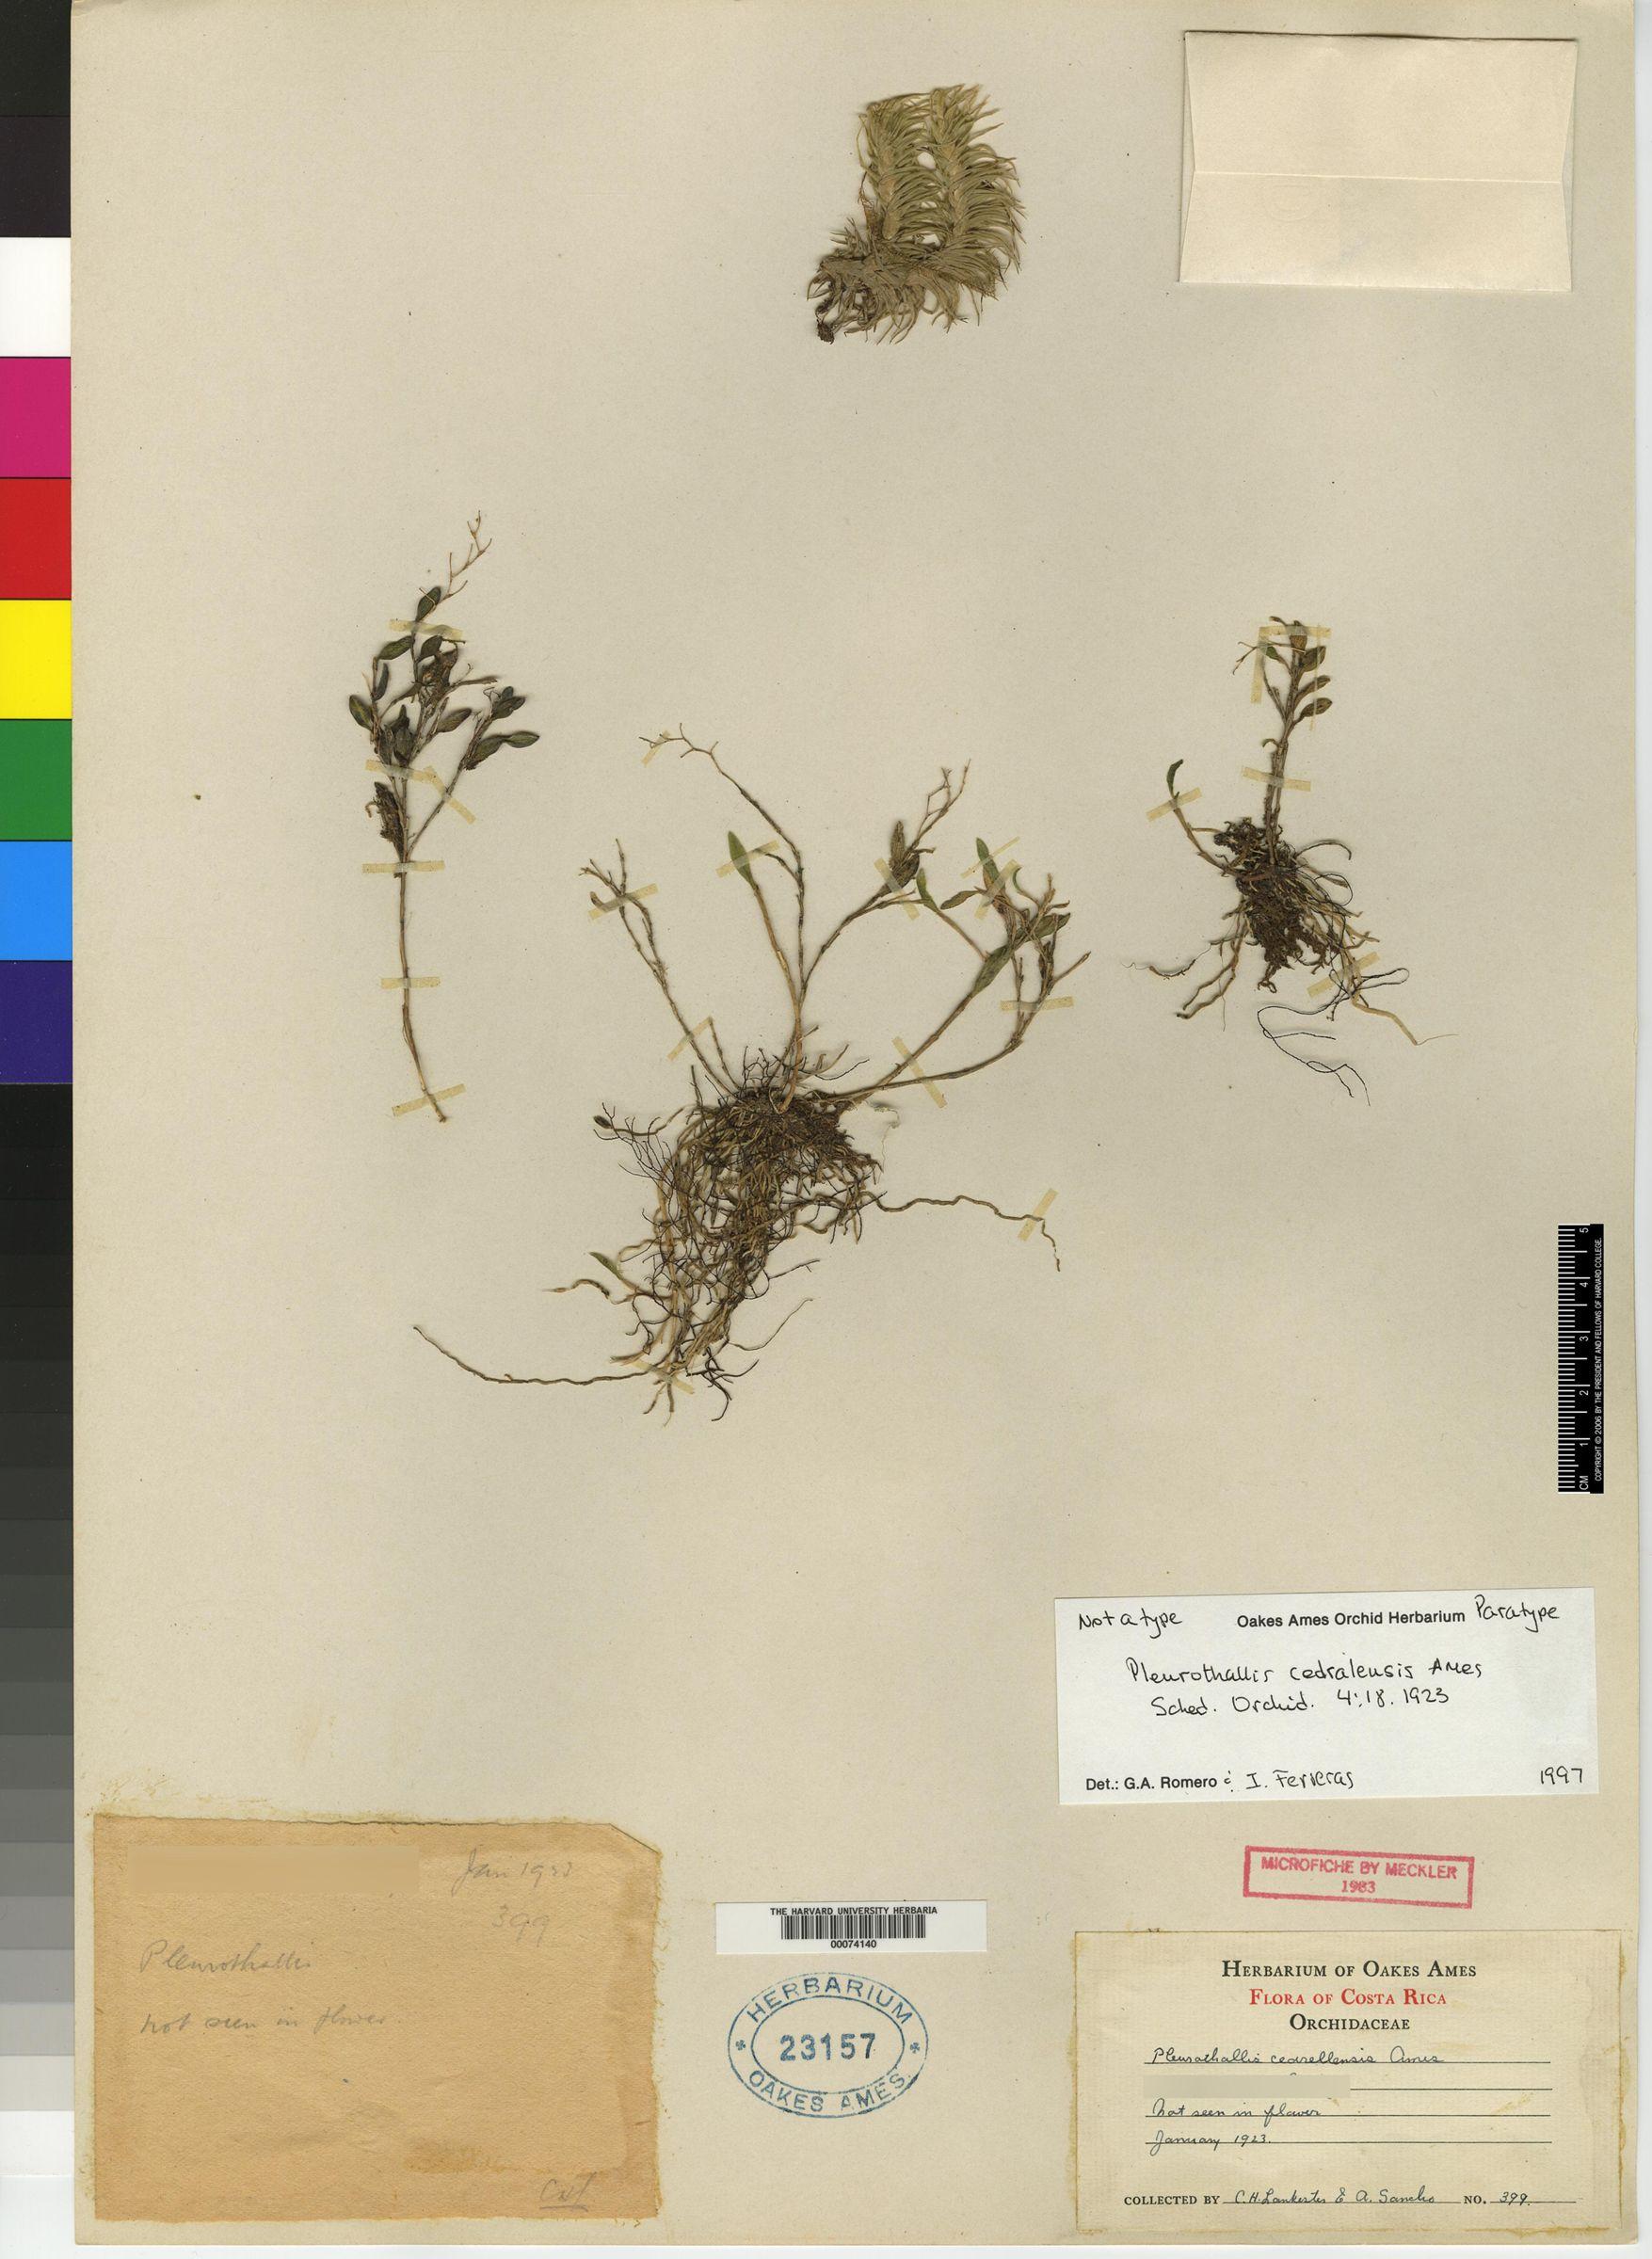 Trichosalpinx cedralensis image